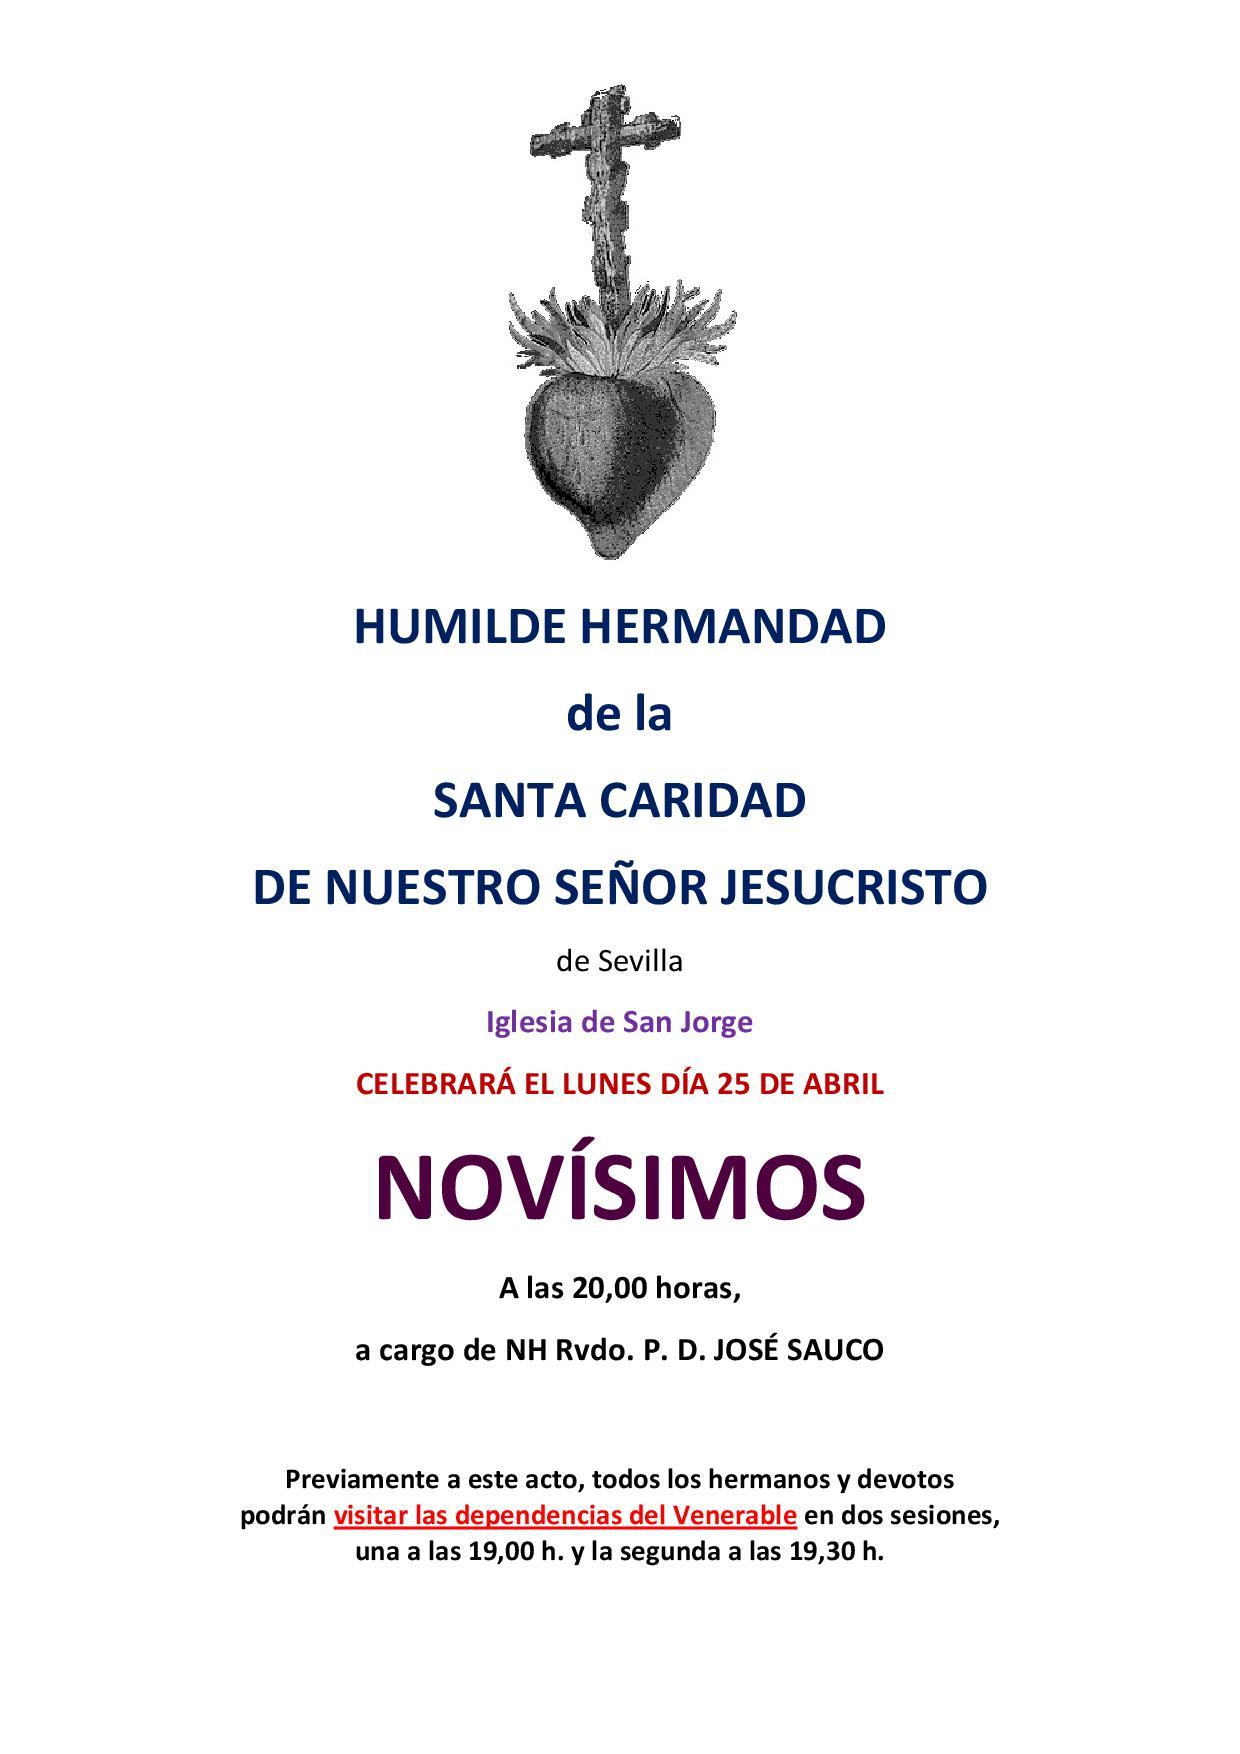 NOVISIMOSABRIL16-001